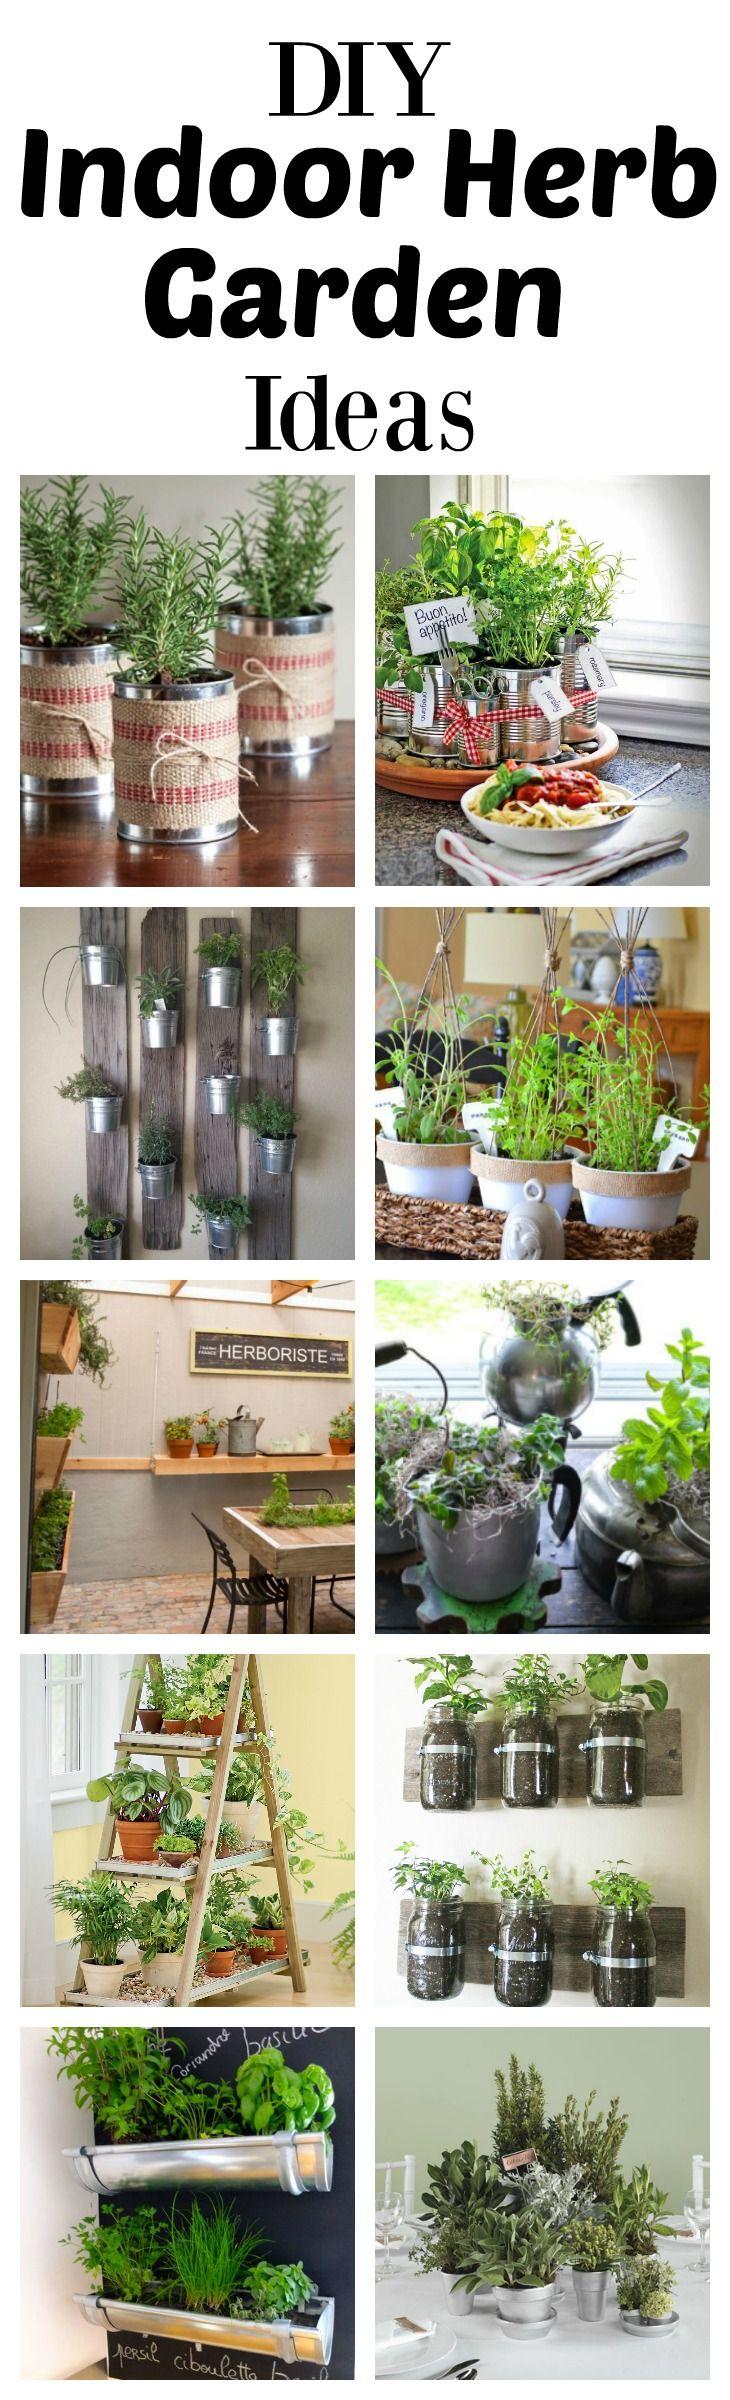 DIY Indoor Herb Garden Ideas | Worthing Court